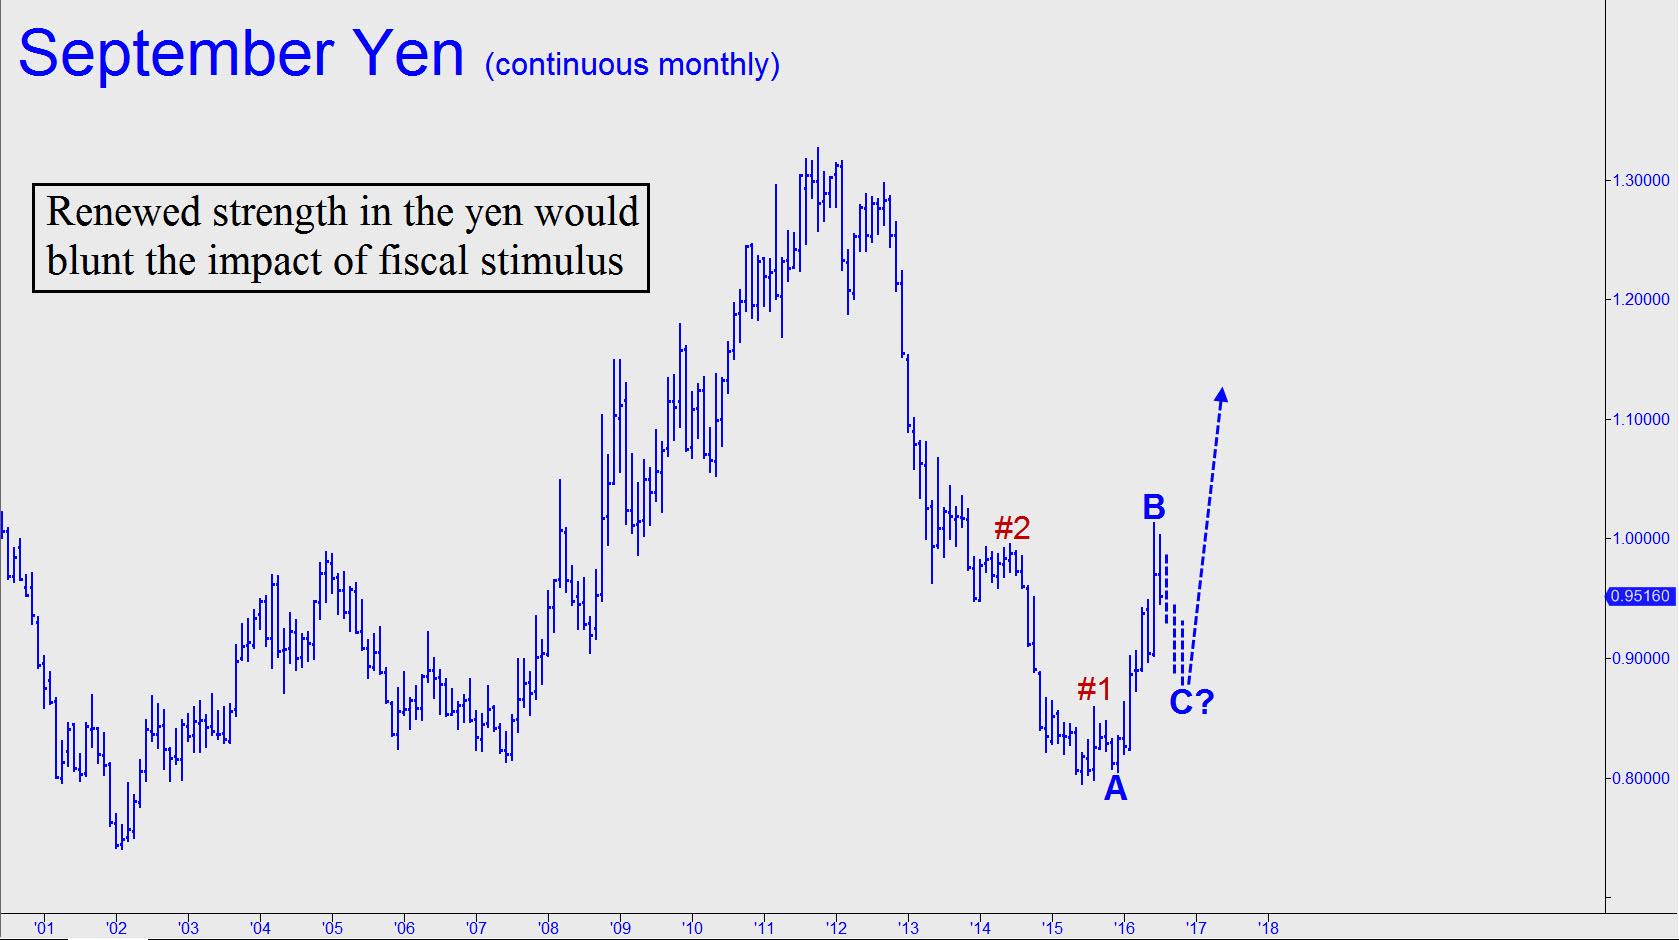 http://www.rickackerman.com/wp-content/uploads/2016/07/Renewed-strength-in-the-yen1.jpg